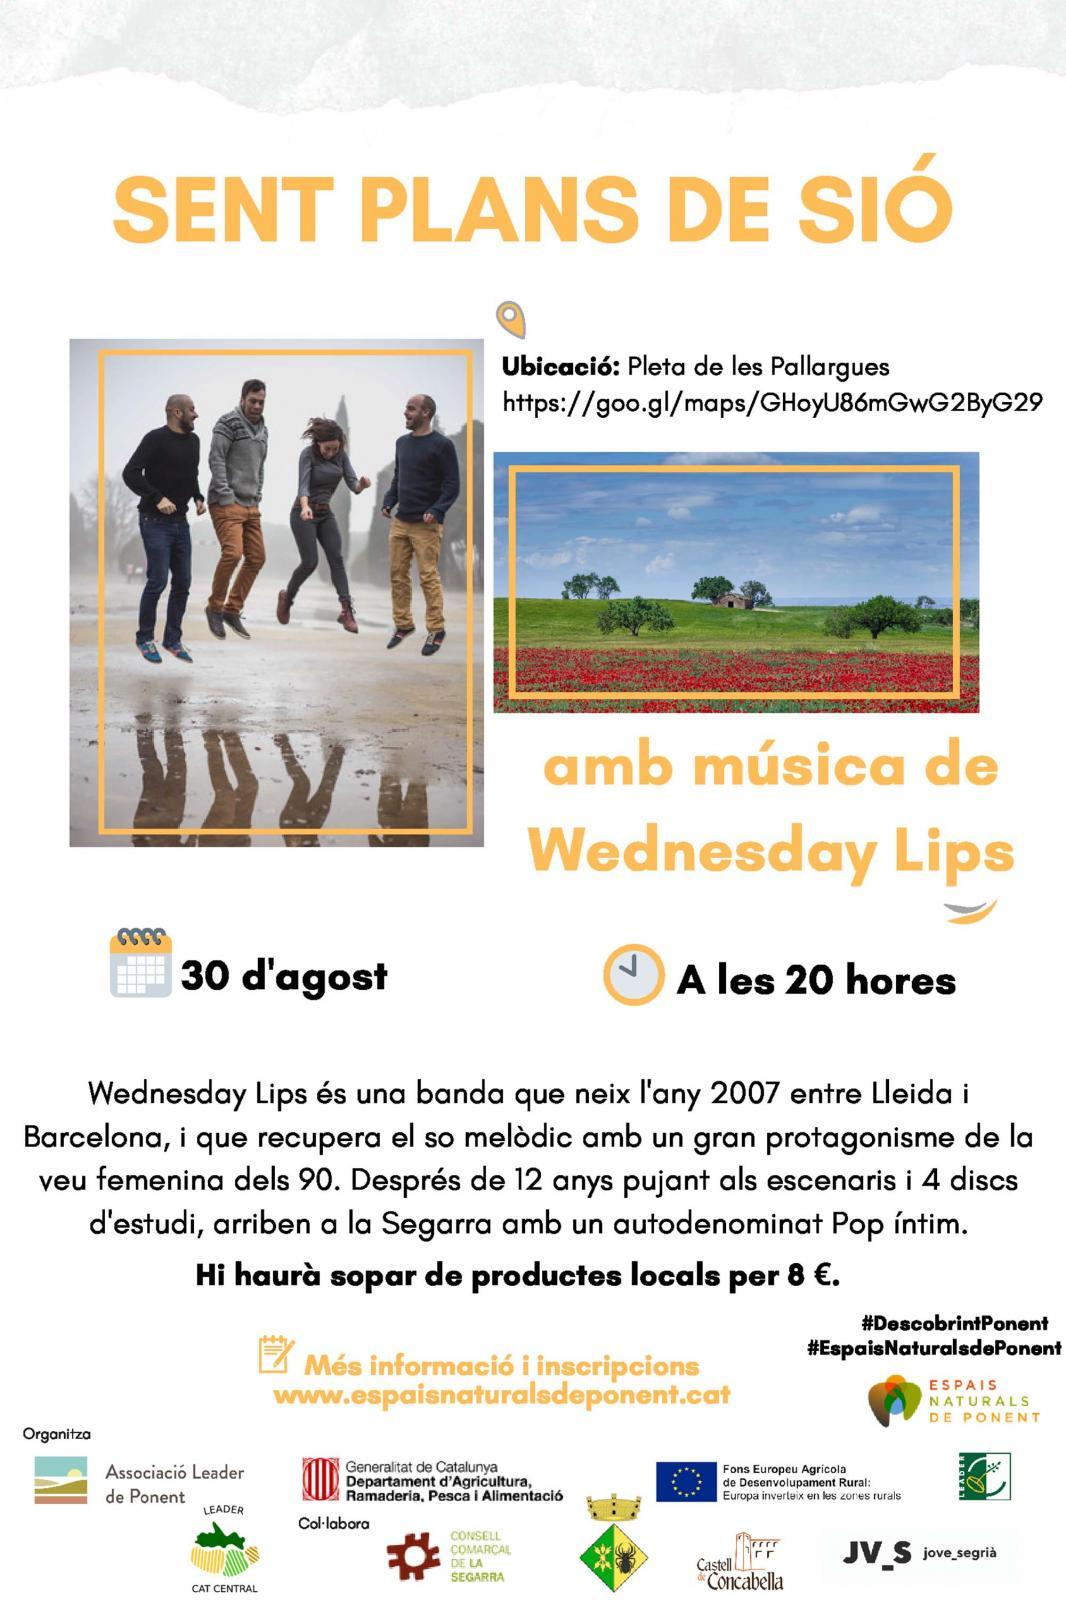 cartell Sent Plans de Sió 'Concert Wednesday Lips i sopar'